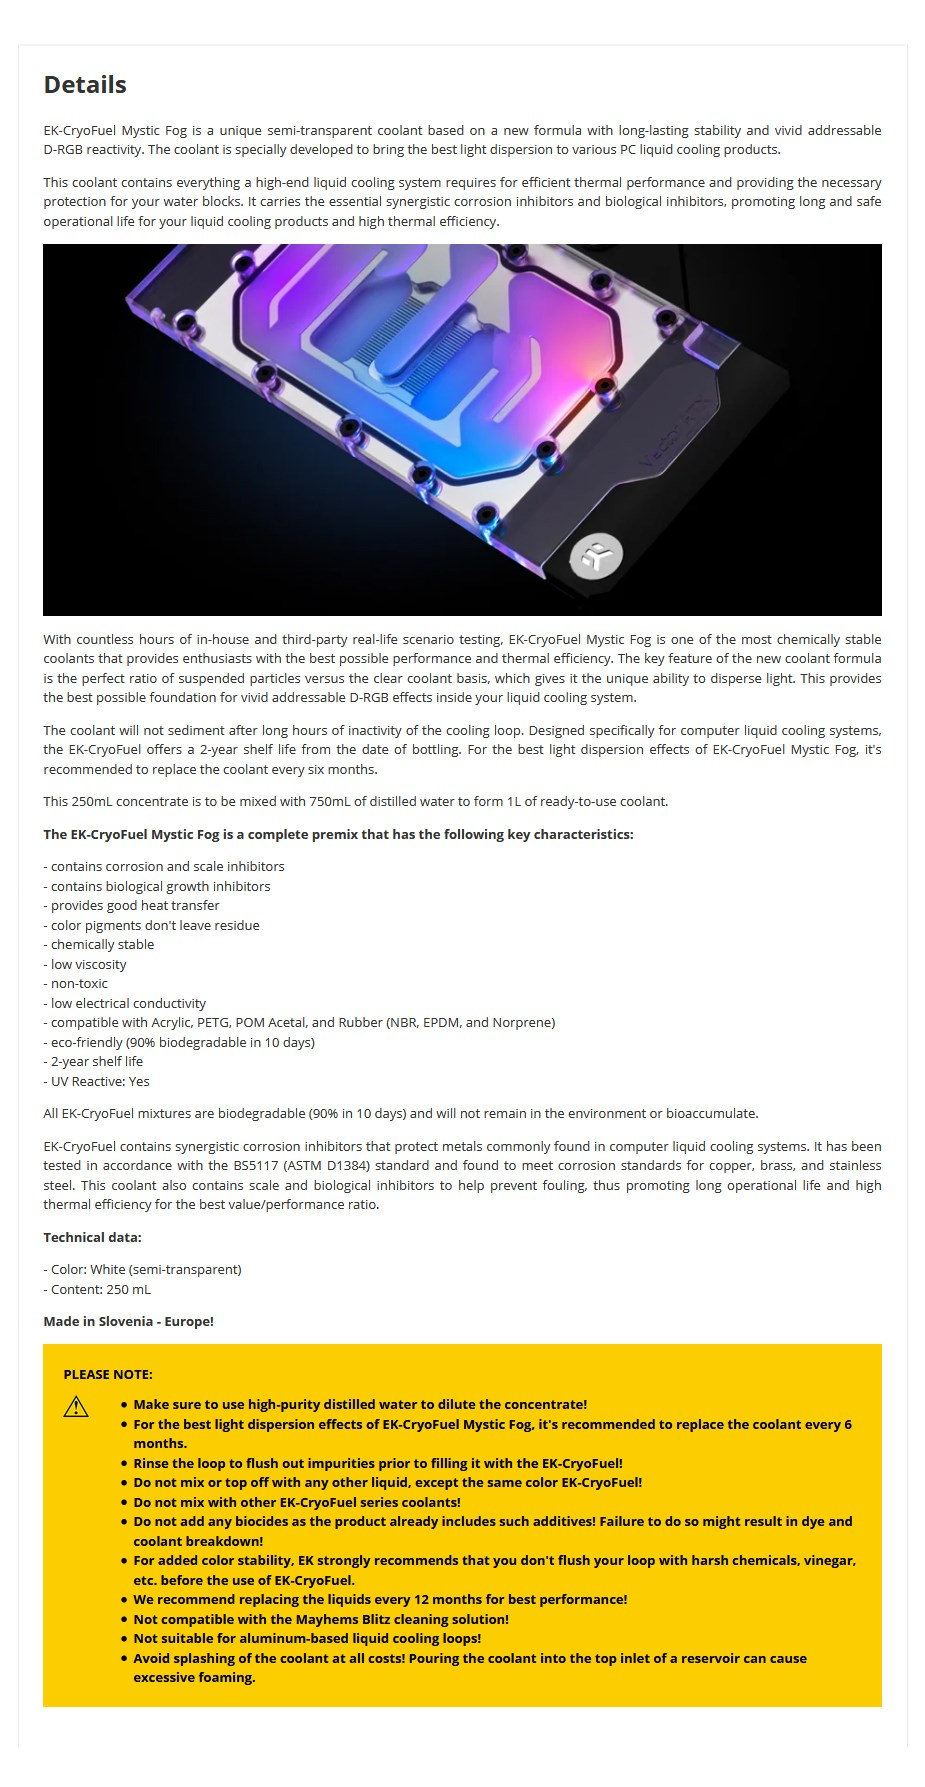 EKWB EK-CryoFuel Mystic Fog Concentrate 250mL Coolant - Overview 1